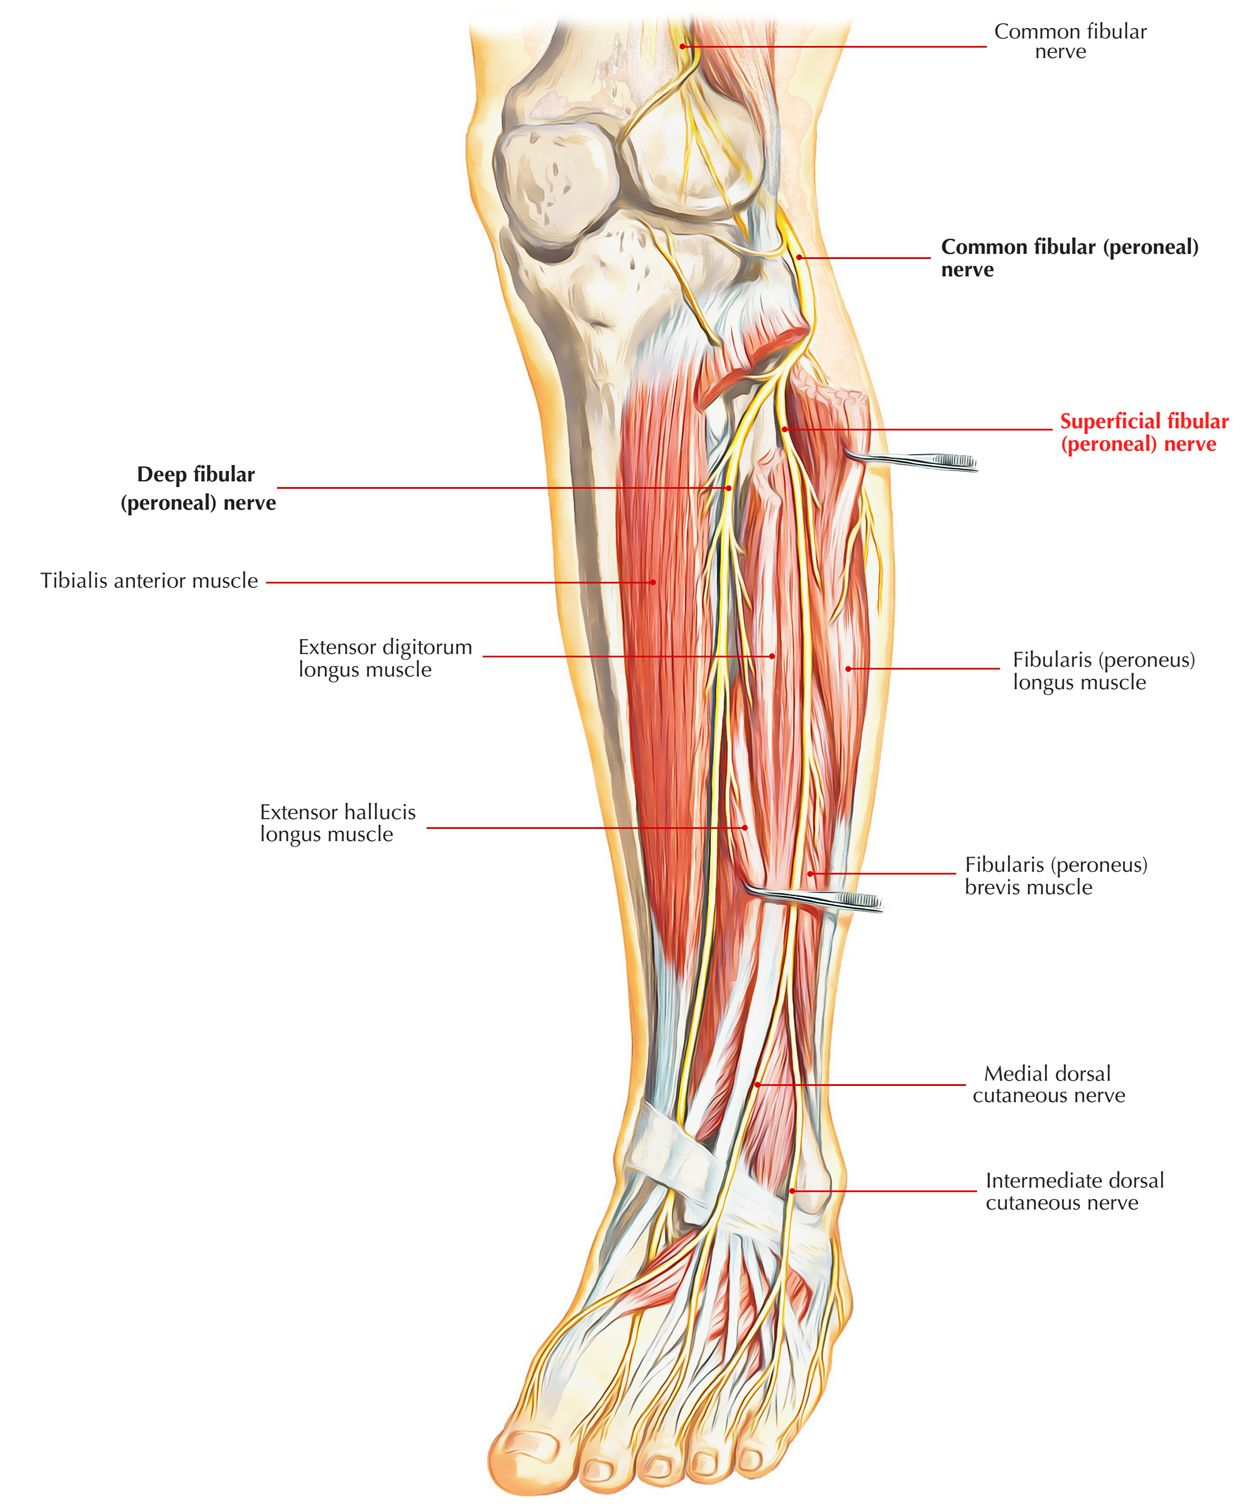 foot nerve diagram wiring diagram inside foot diagram nerve endings foot nerve diagram [ 1250 x 1506 Pixel ]